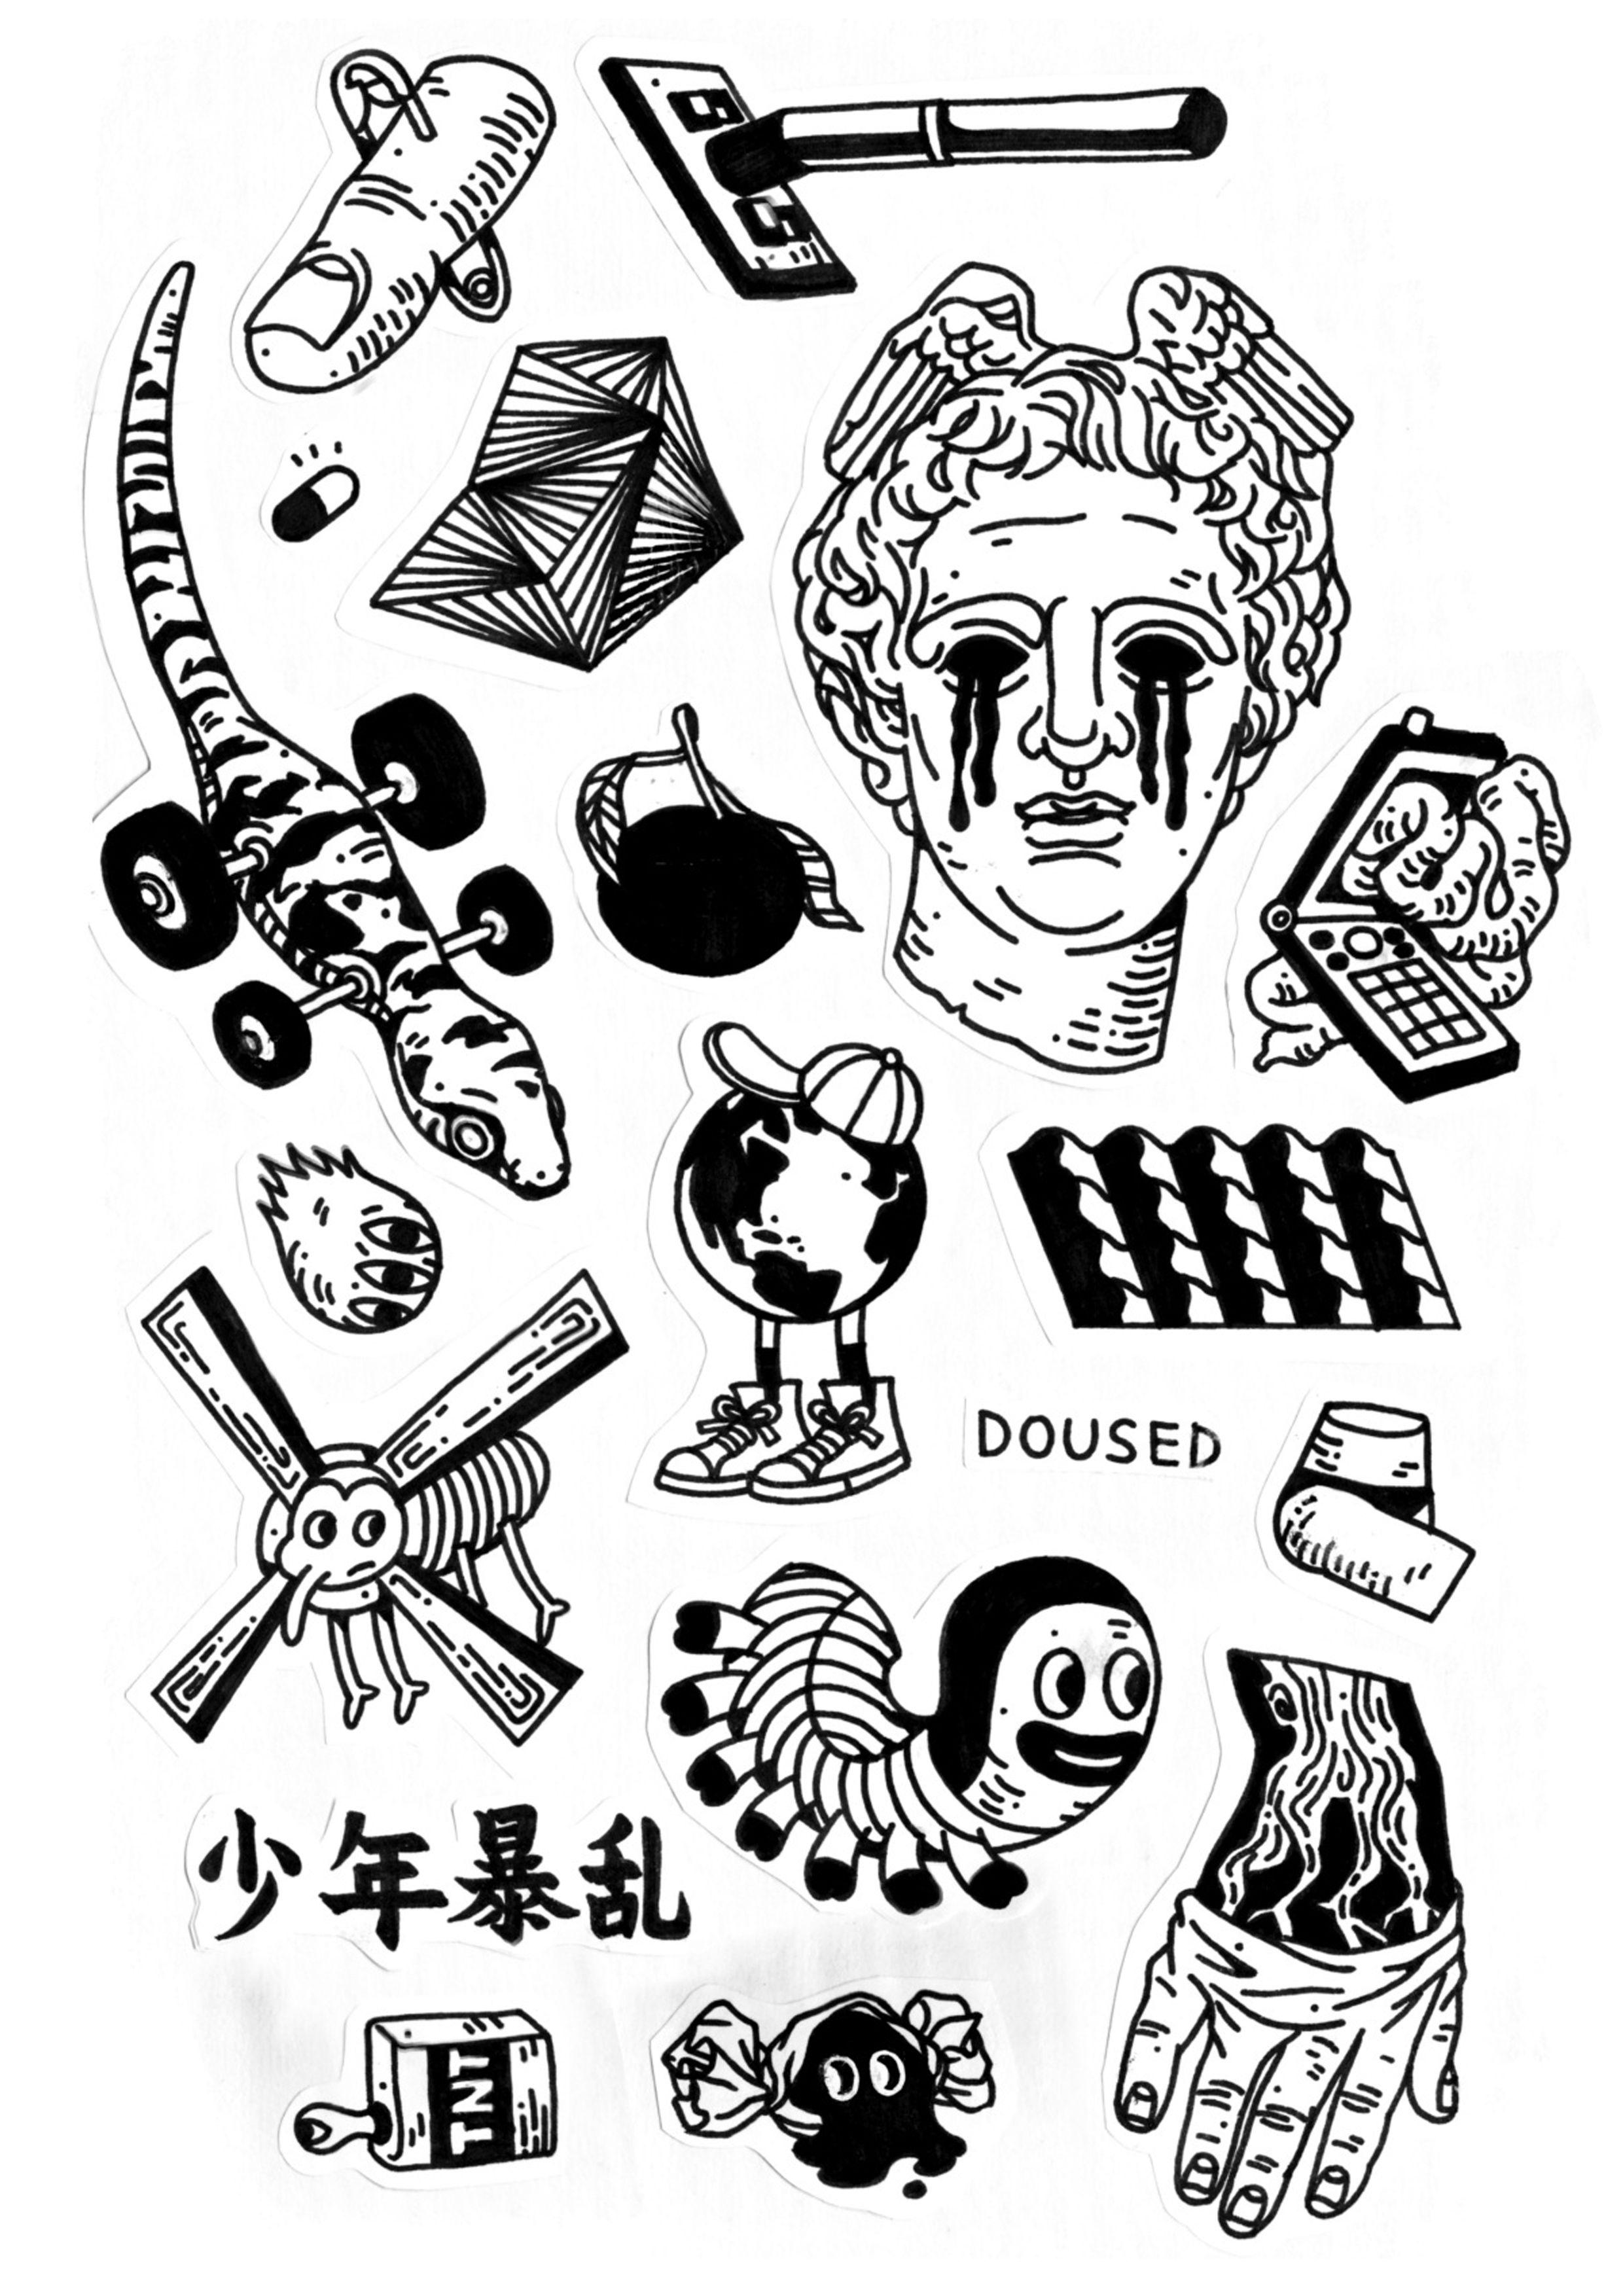 Tattoo Arts Byfrancesjiao татуировка тату минимализм идеи для